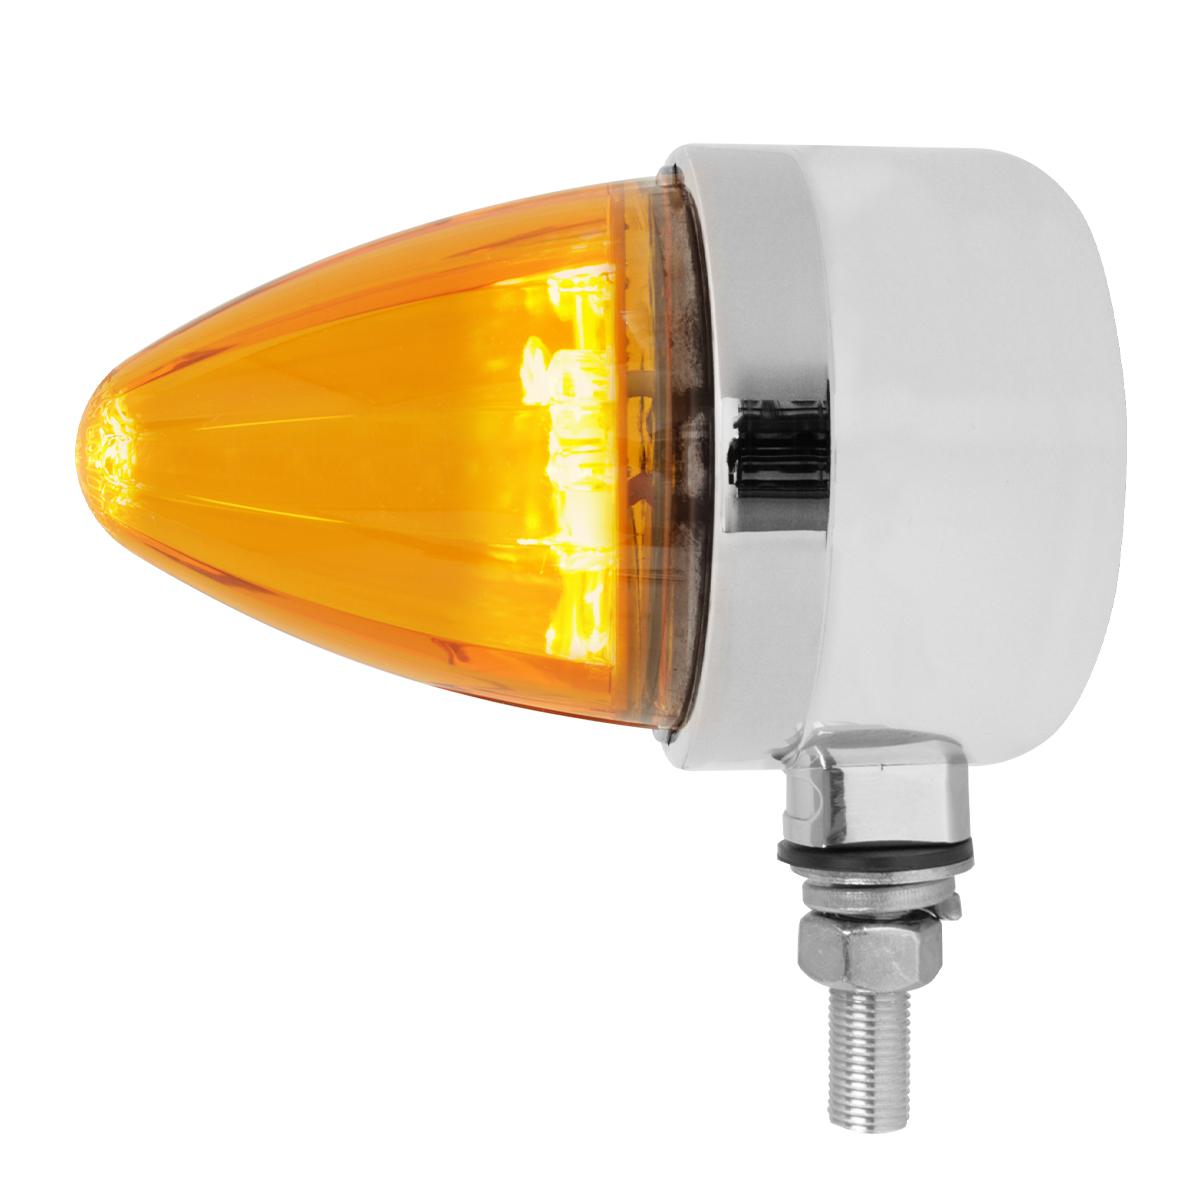 81970 Single Face Watermelon Bullet LED Pedestal Light in Amber/Amber